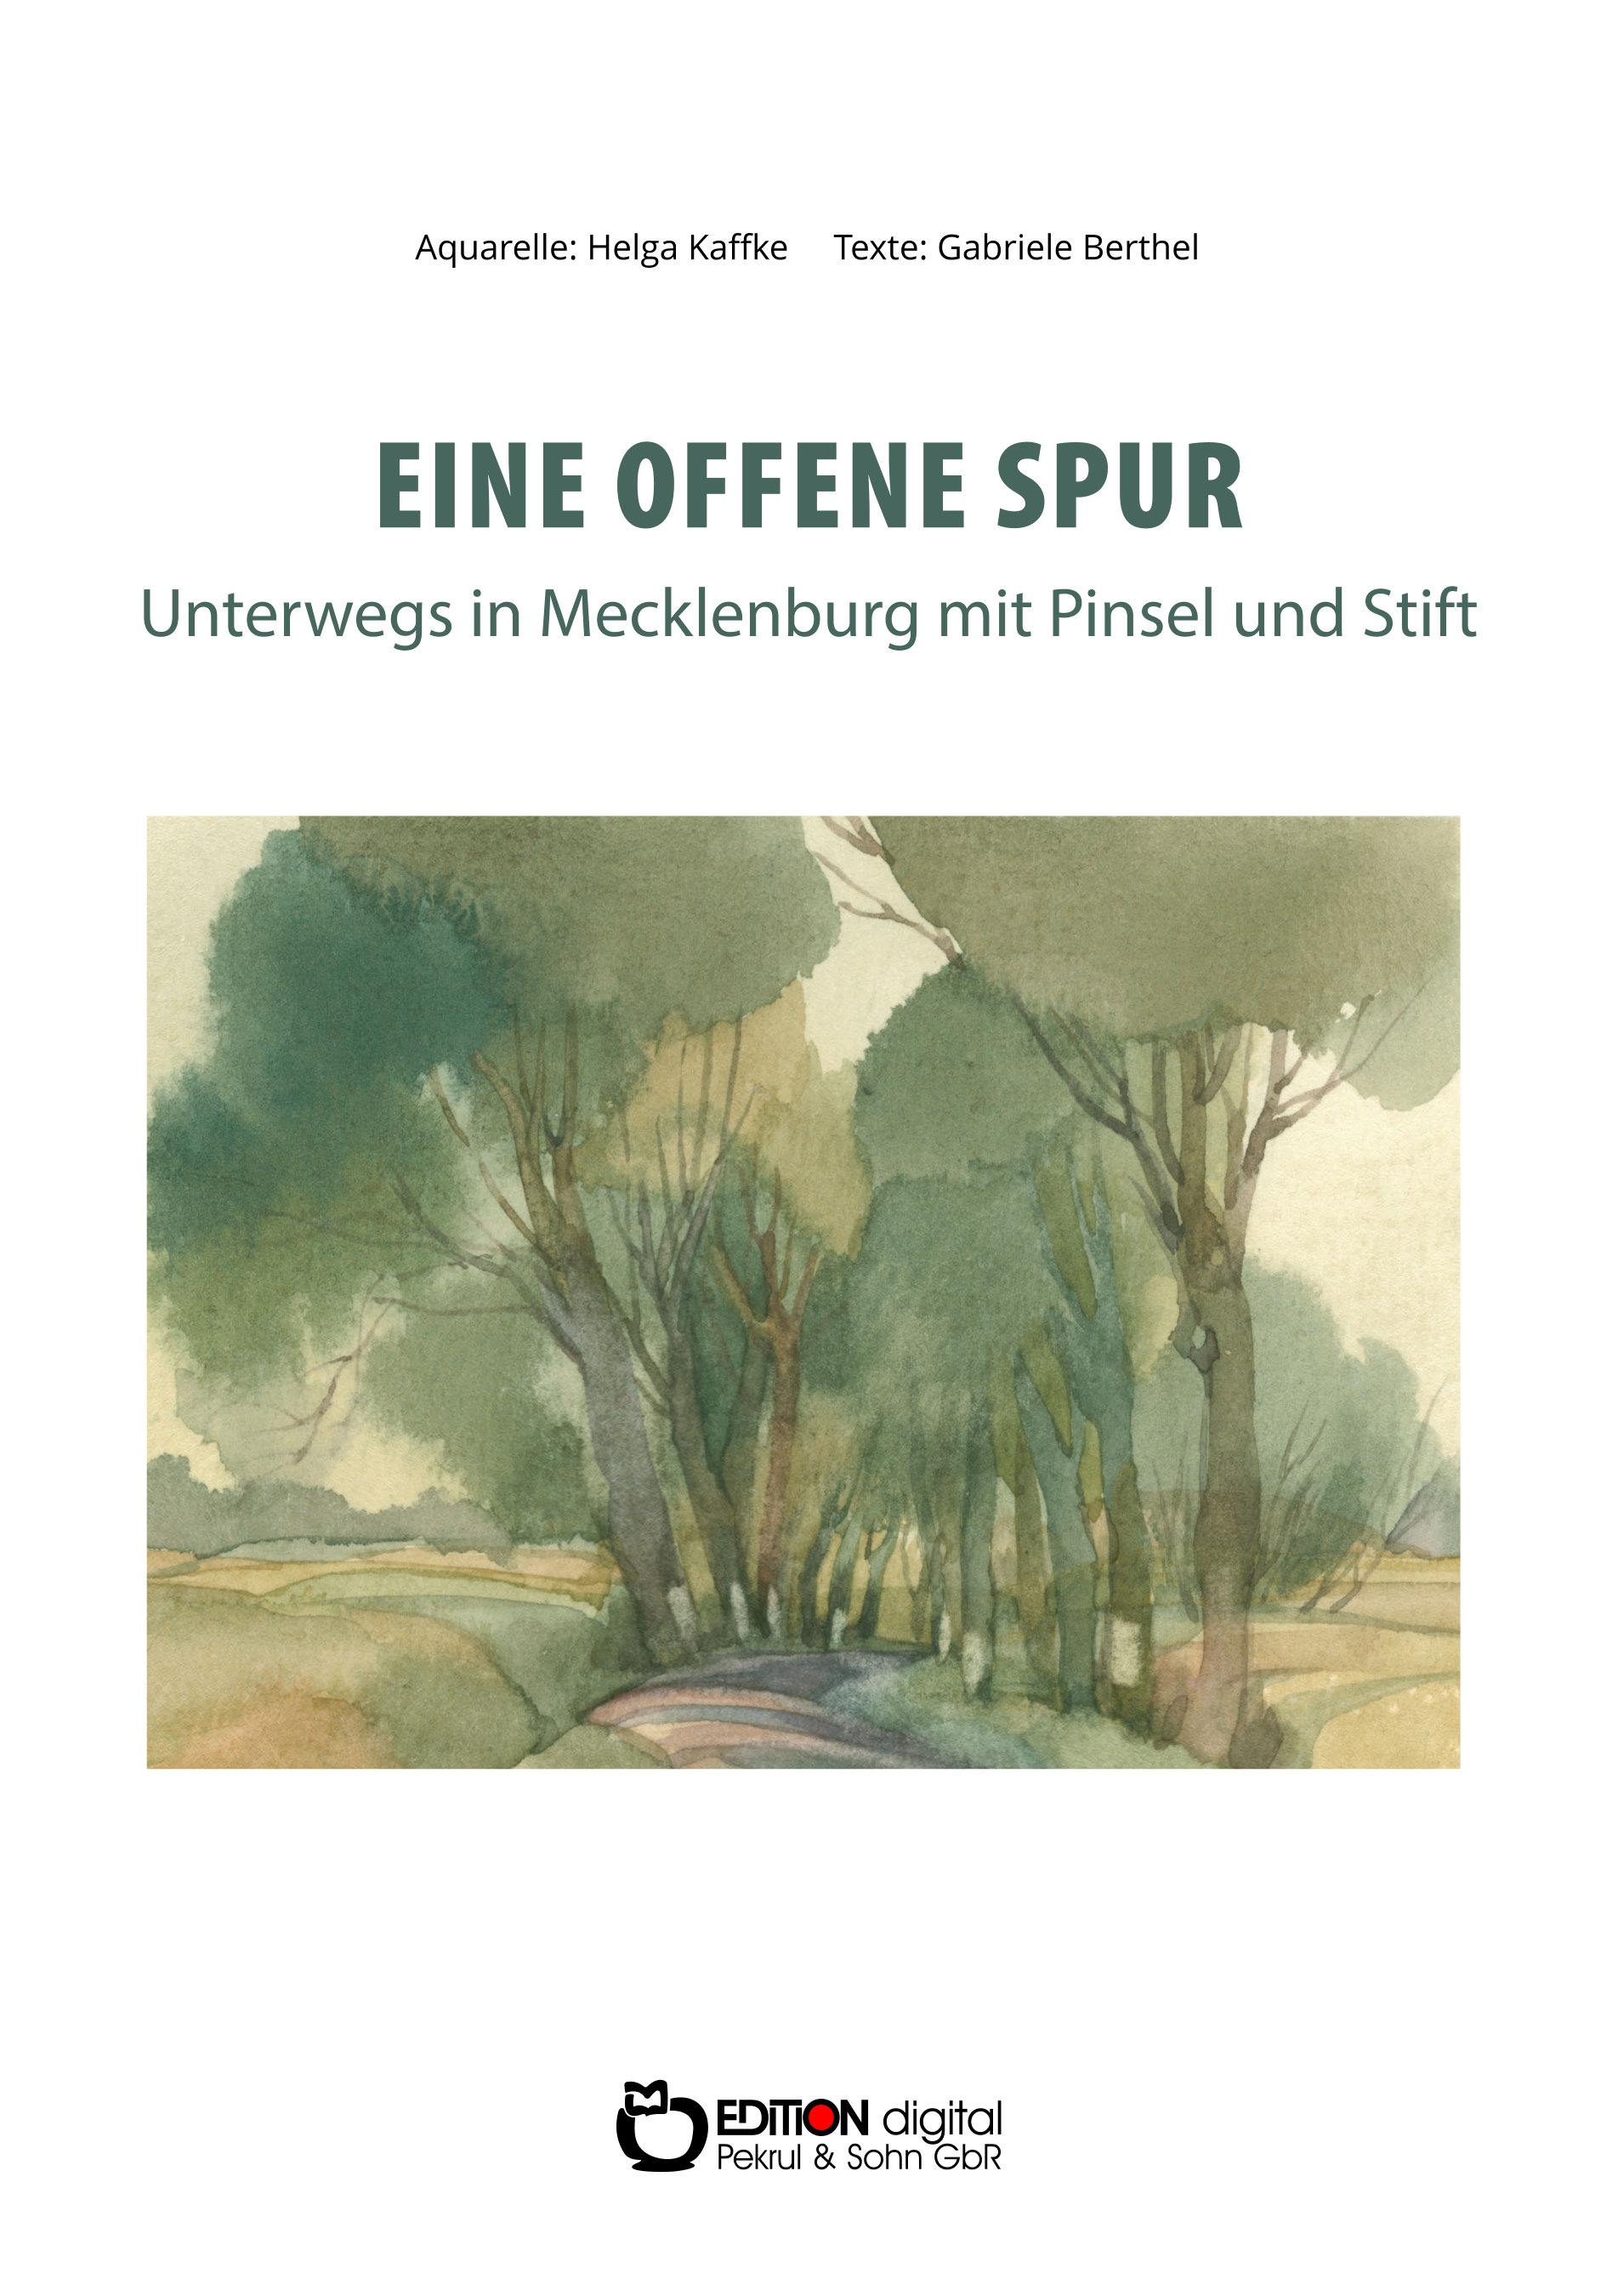 2019-04-04 OffeneSpur